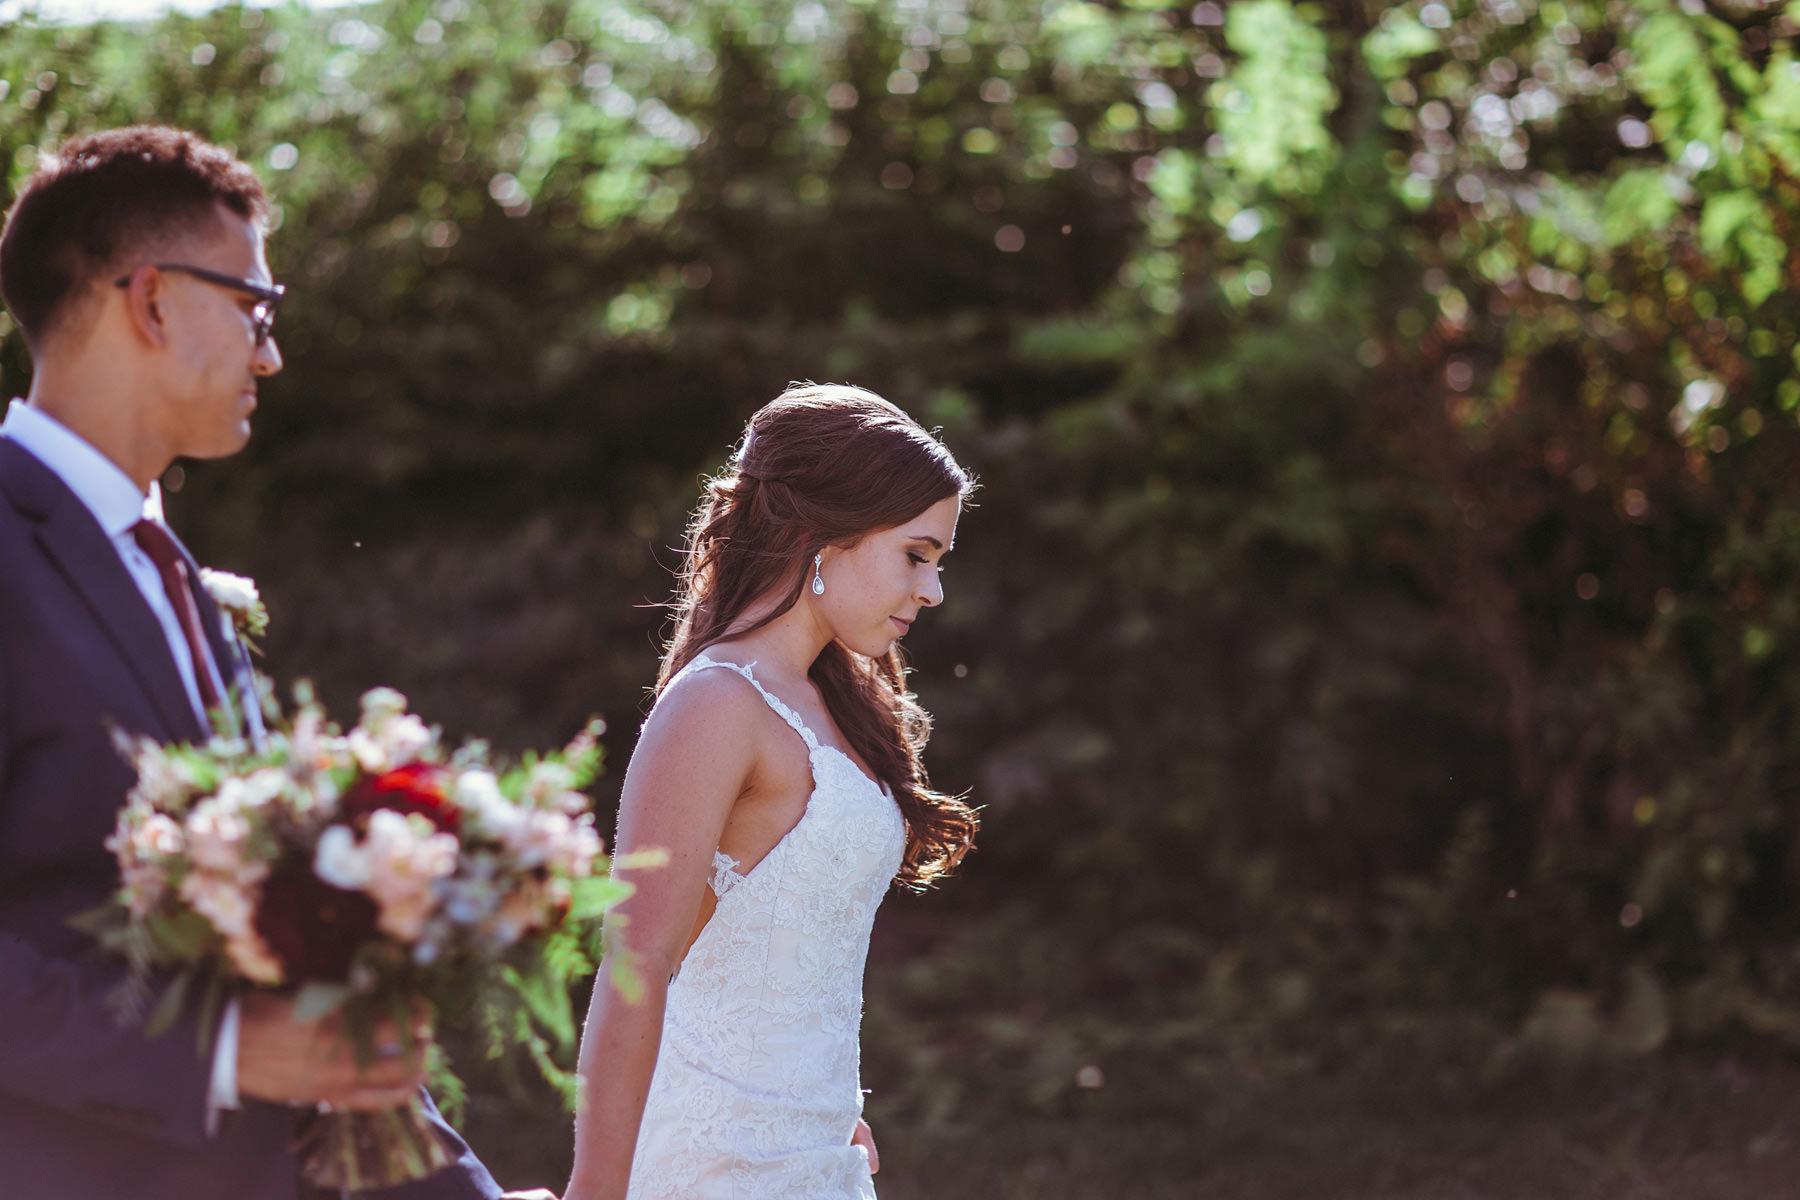 Kansas City Summer Wedding at the Guild_Kindling Wedding Photography Blog43.JPG